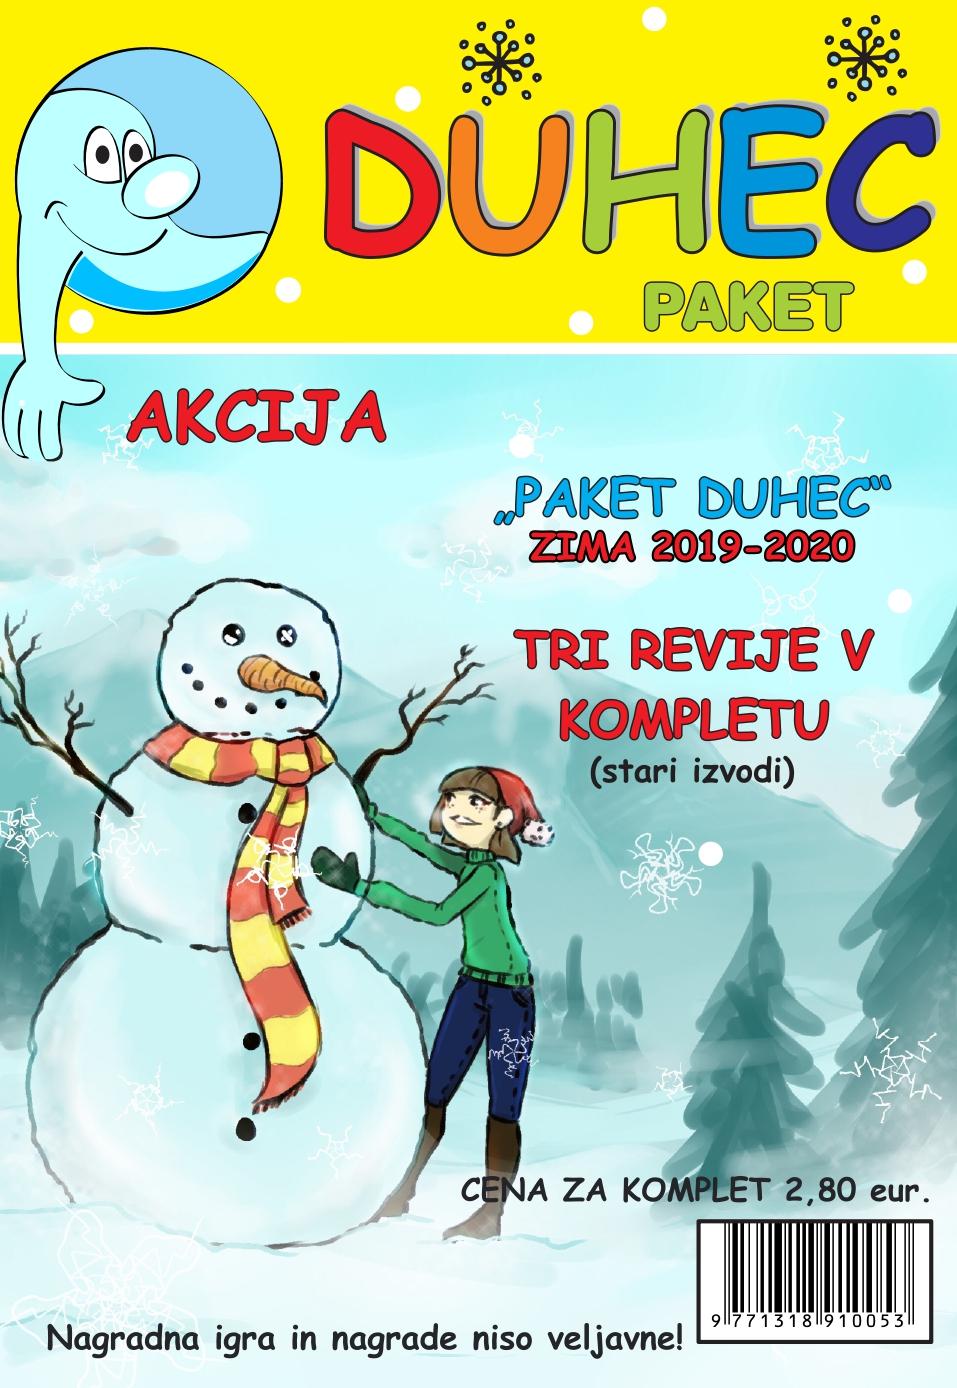 2019-2020 zima duhec paket_page-0001